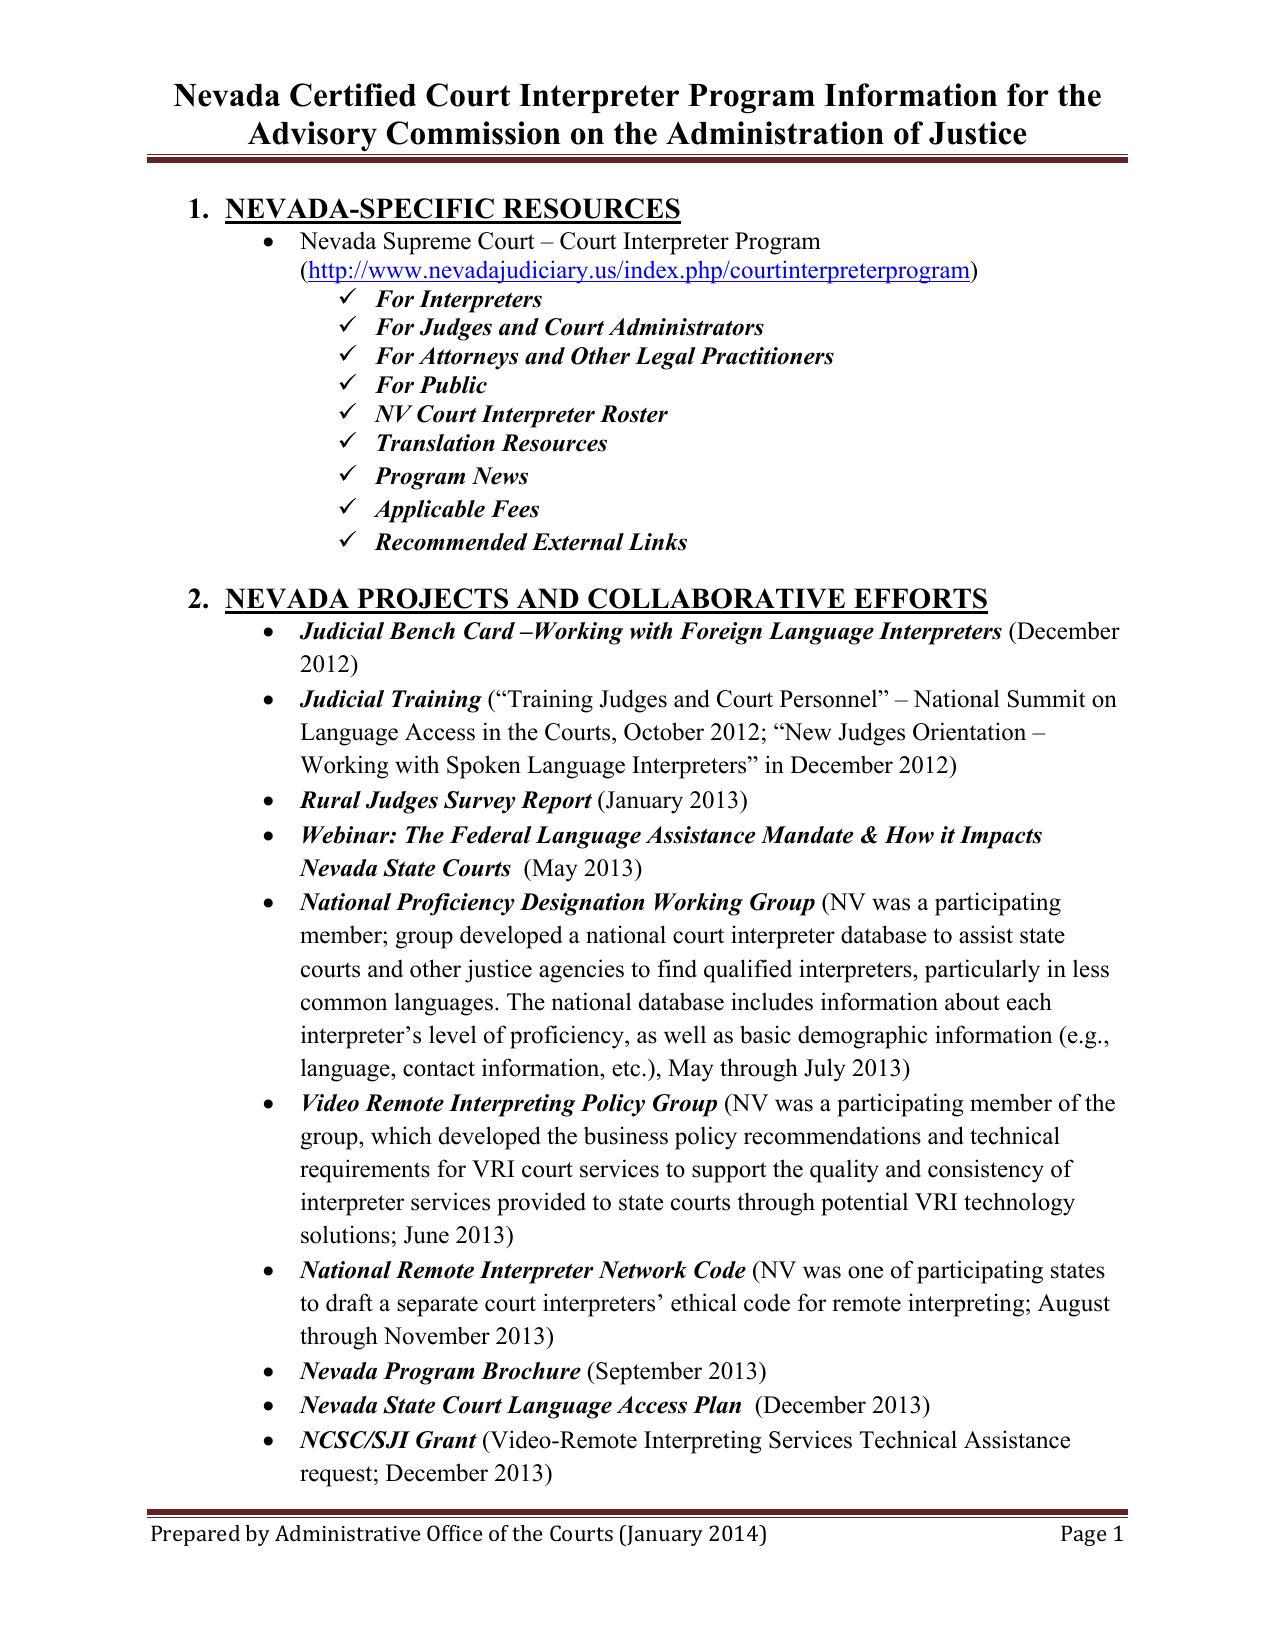 Nevada Certified Court Interpreter Program Information For The